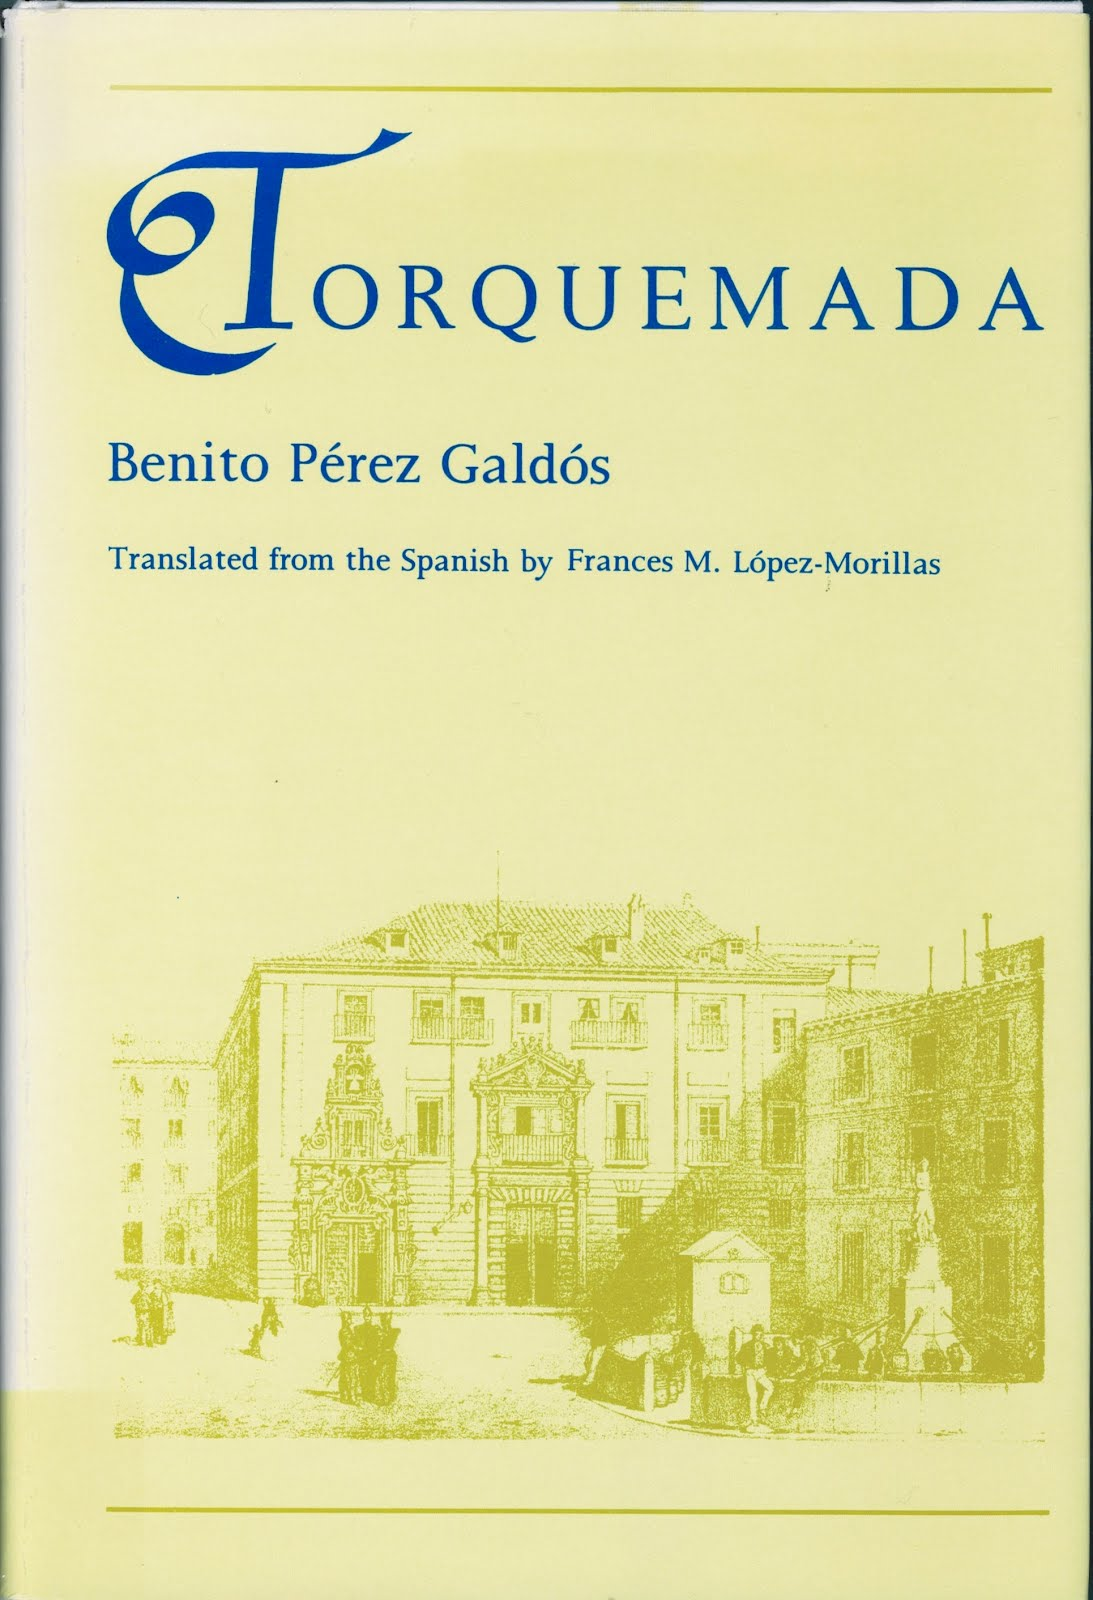 Torquemada, Perez Galdos, Benito